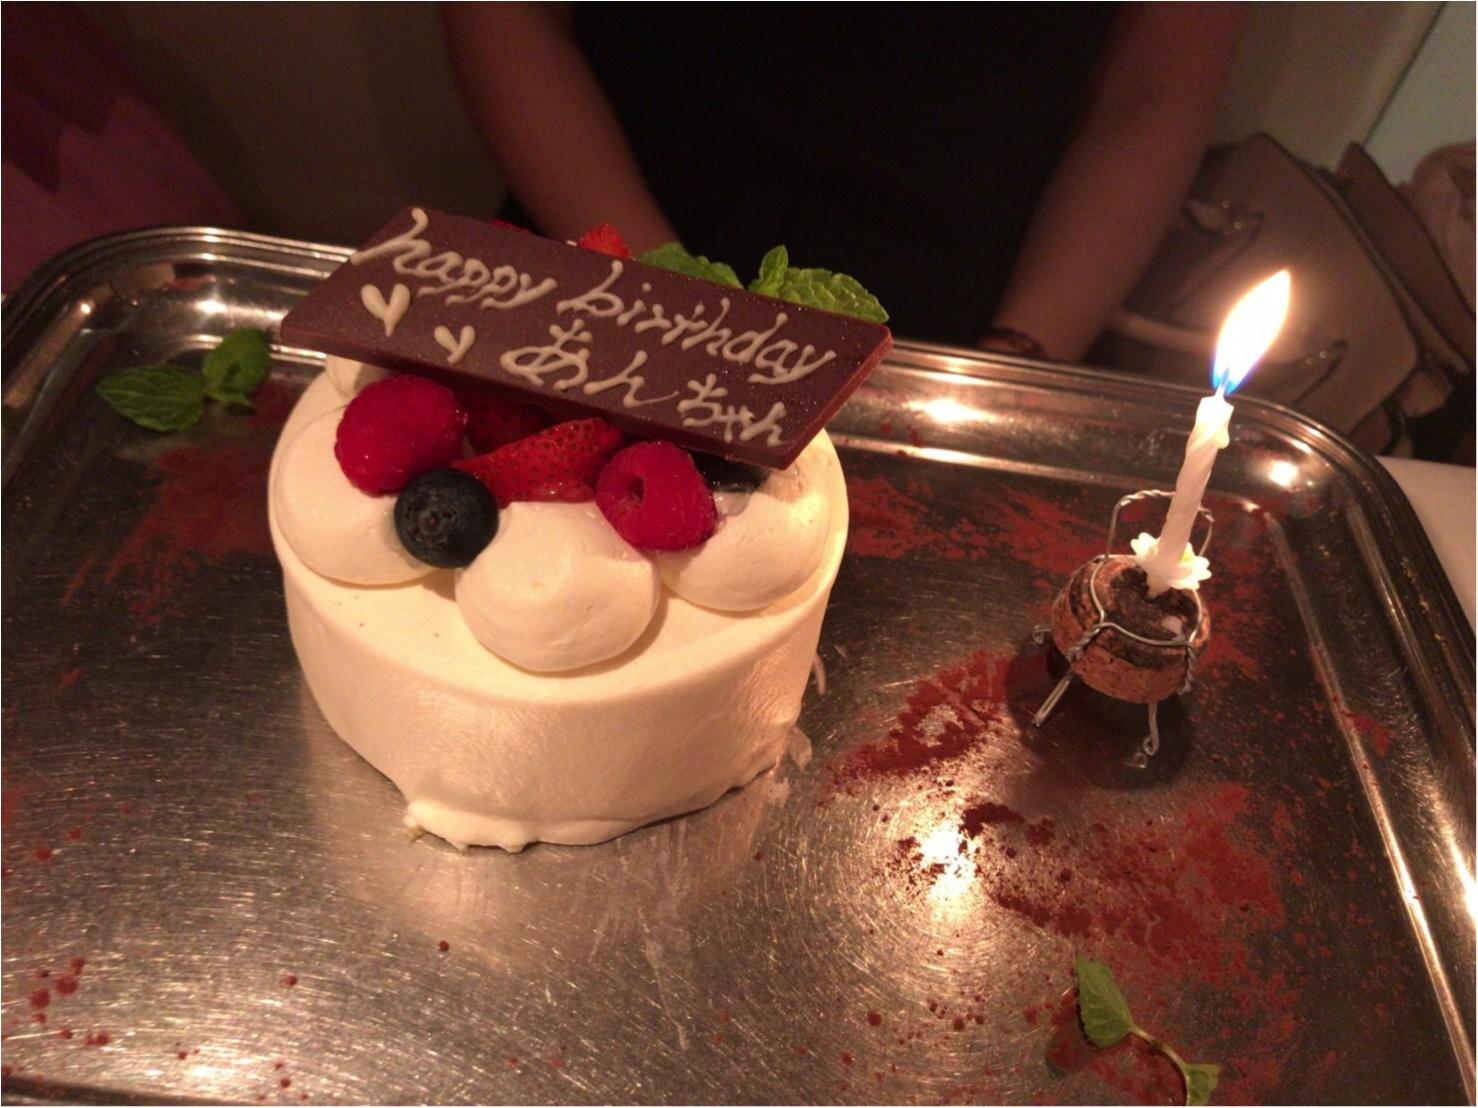 【AUXAMIS TOKYO】東京駅丸ビル35階絶景のフレンチレストランで誕生日ディナー♡_9